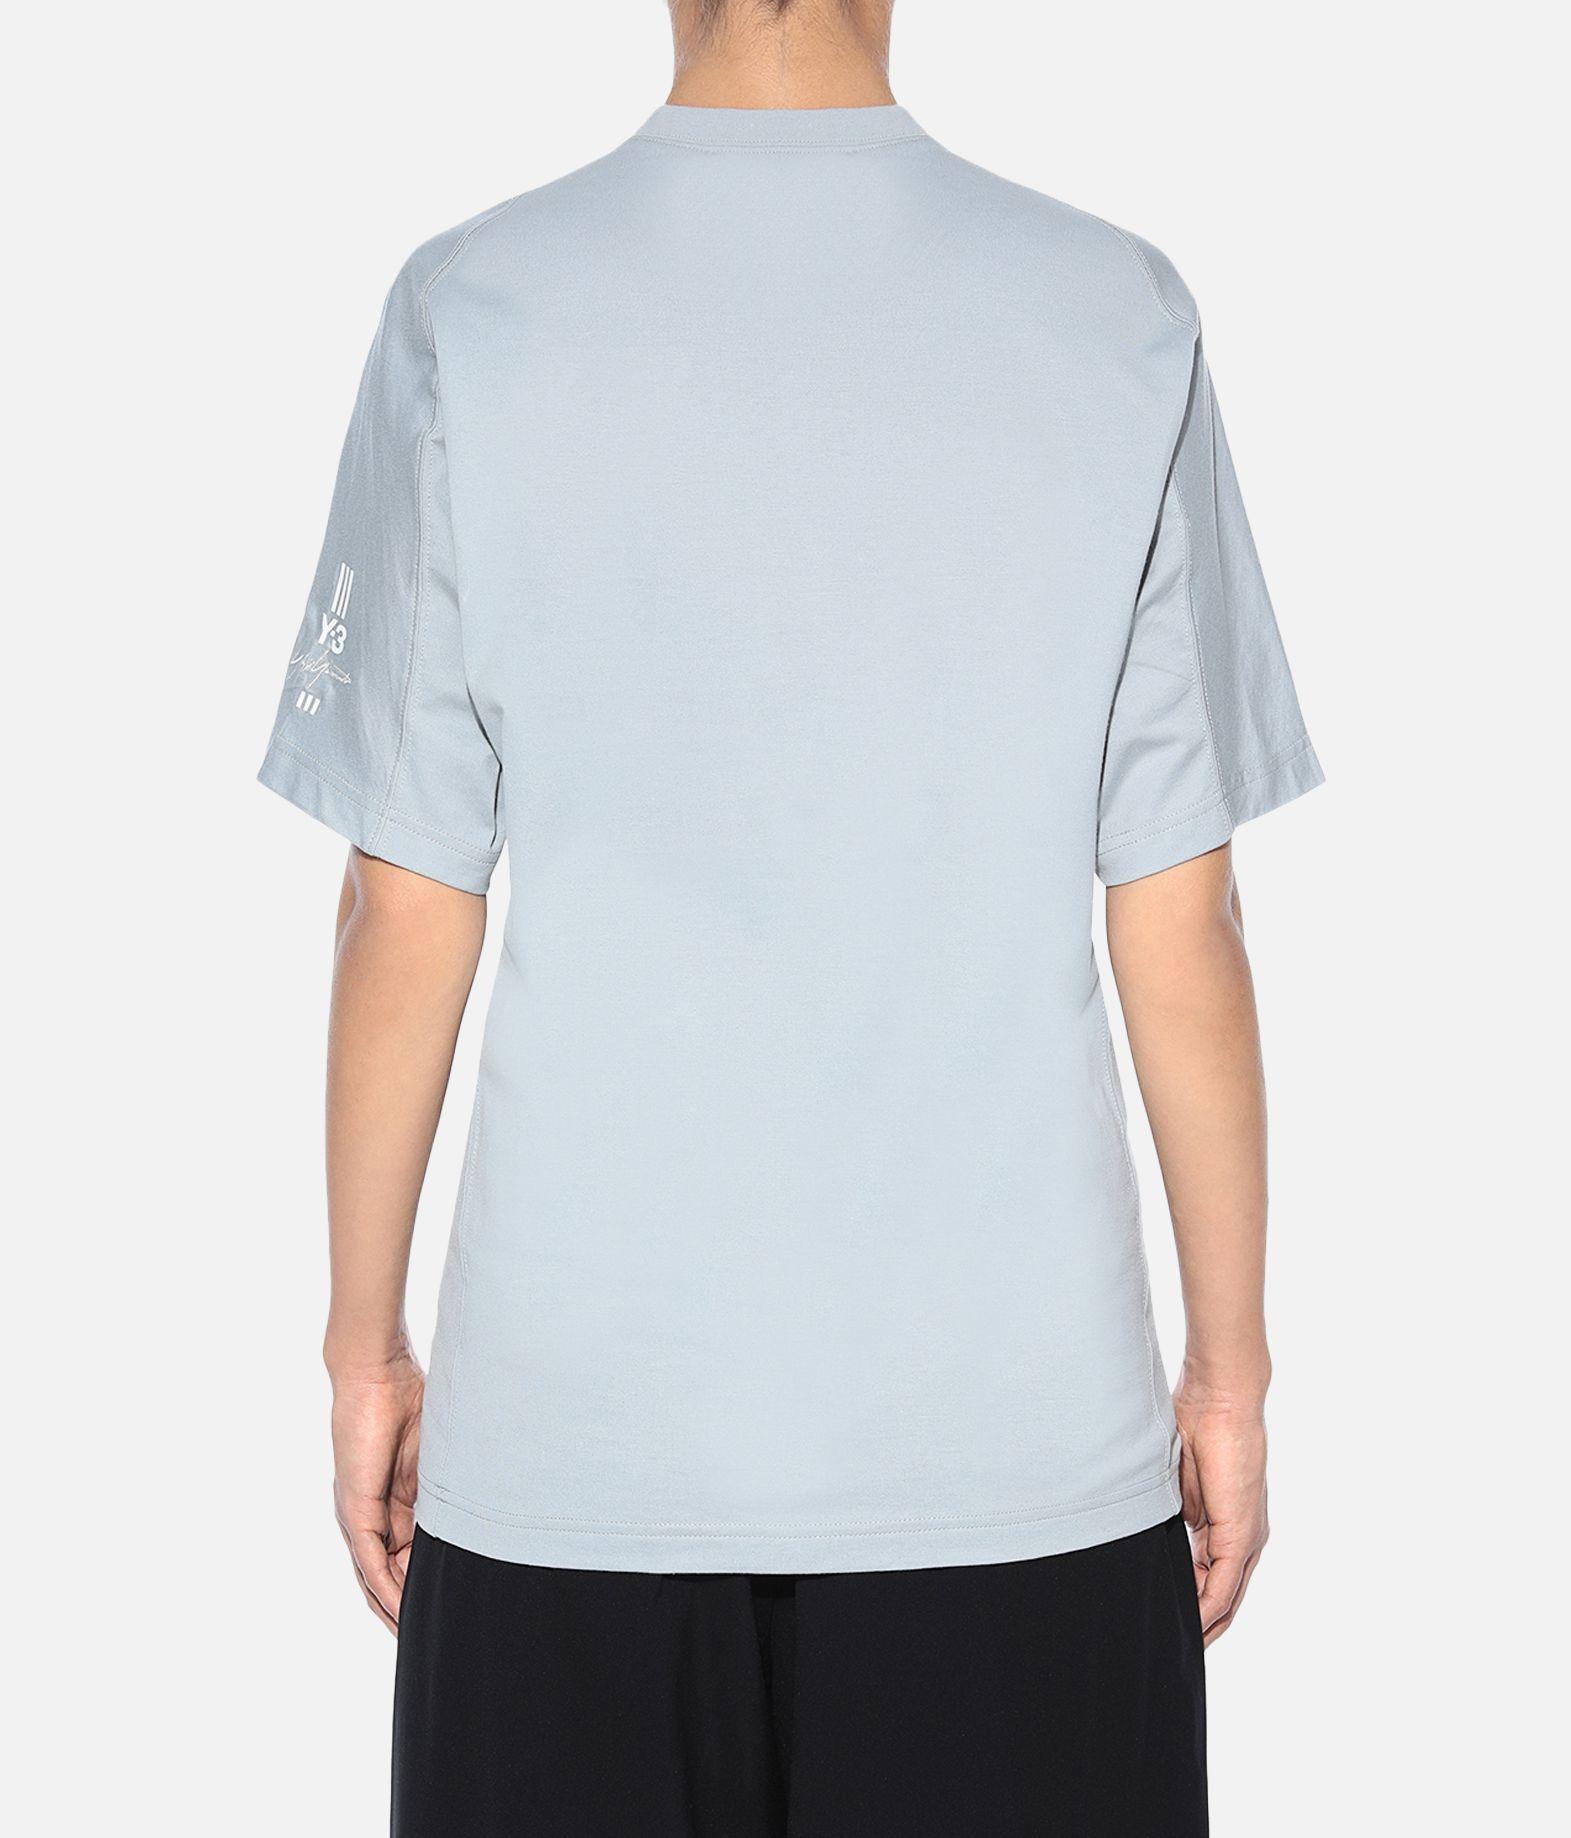 Y-3 Y-3 Classic Tee T-shirt maniche corte Donna d